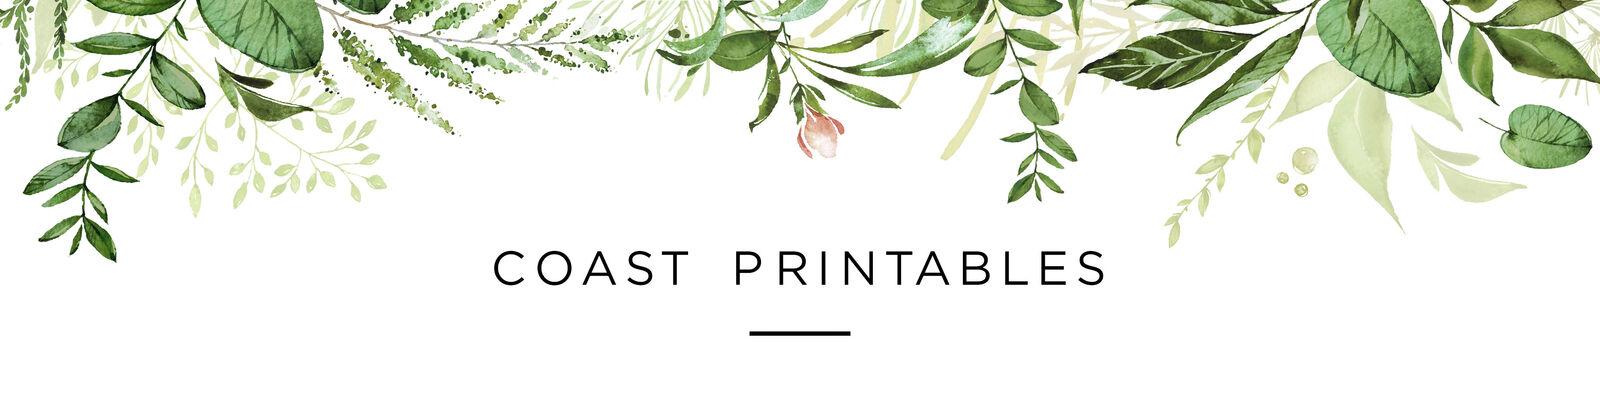 Coast Printables